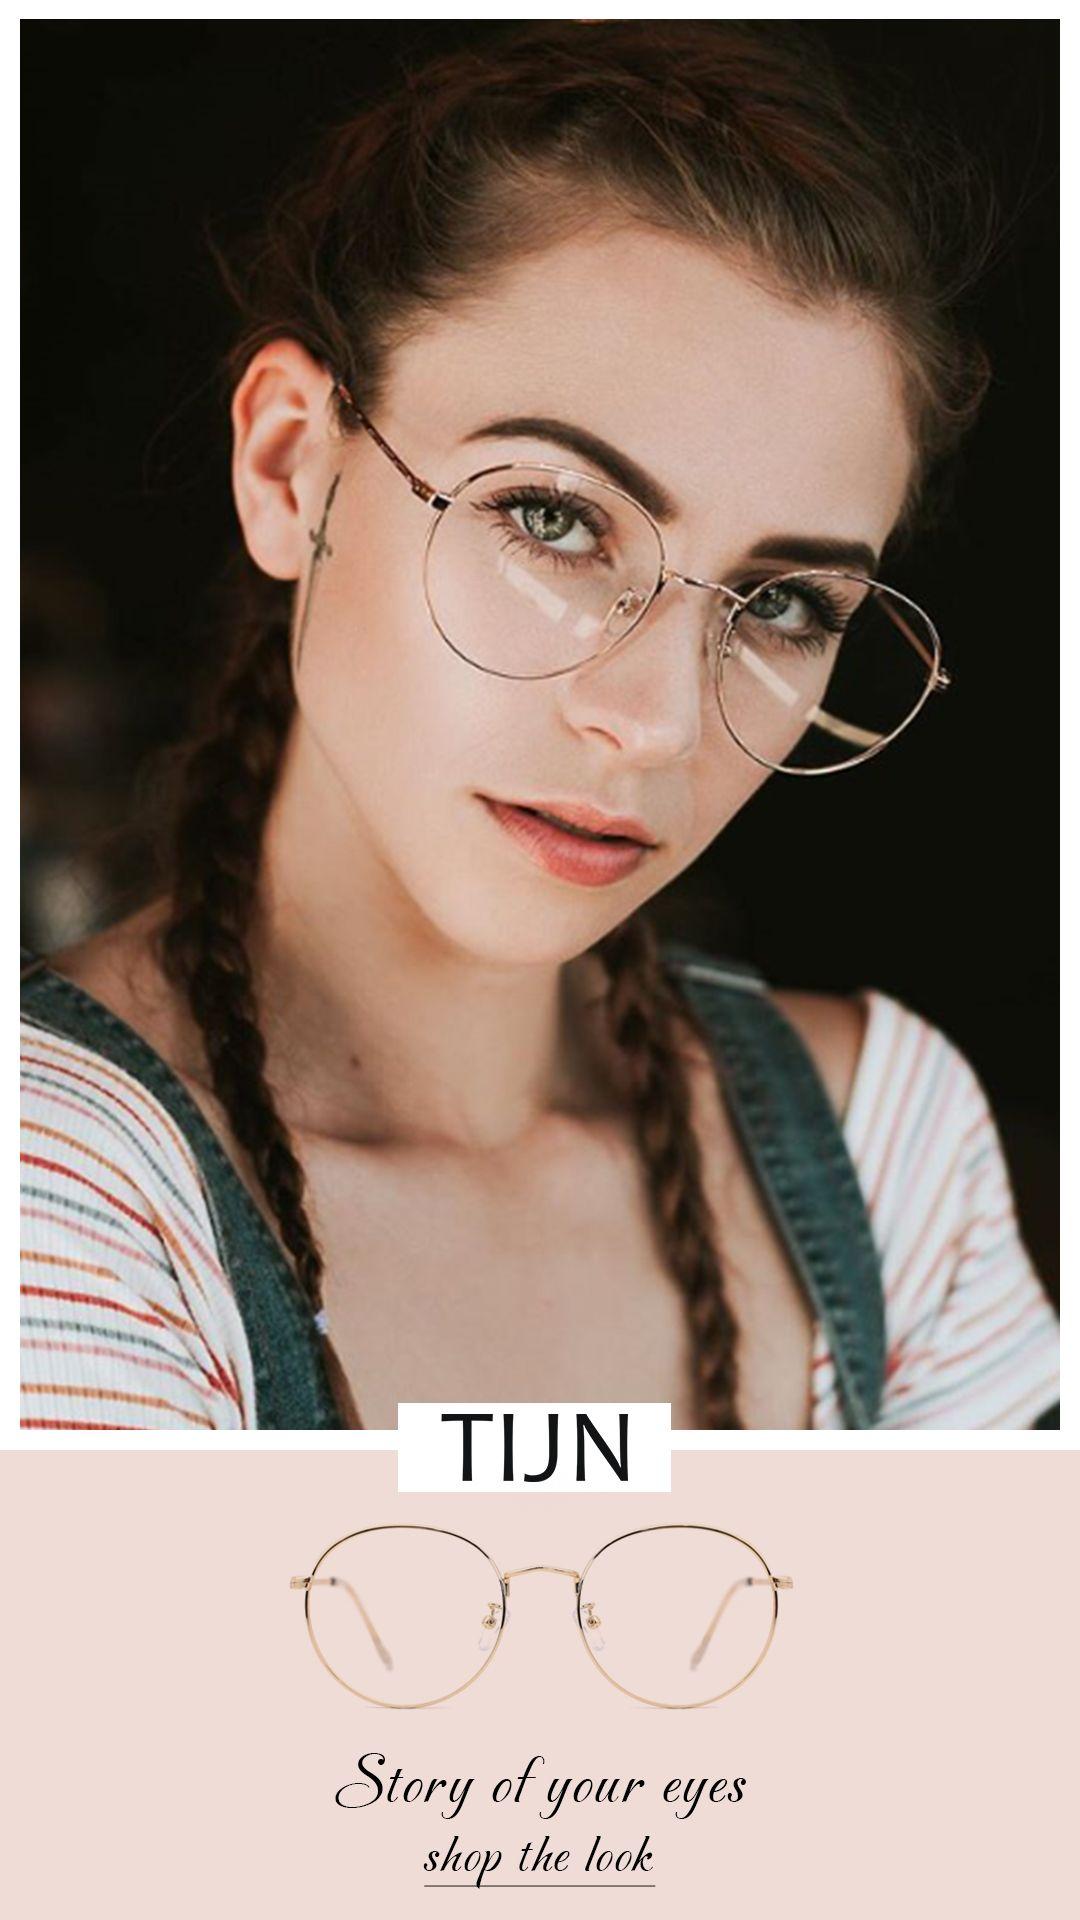 0301df4131  eye-wear  fashion eye-wear  sunglasses eye  fashion accessories  fashion  trend Red Bird Tortoise  Shell Pink glasses eye eye protect